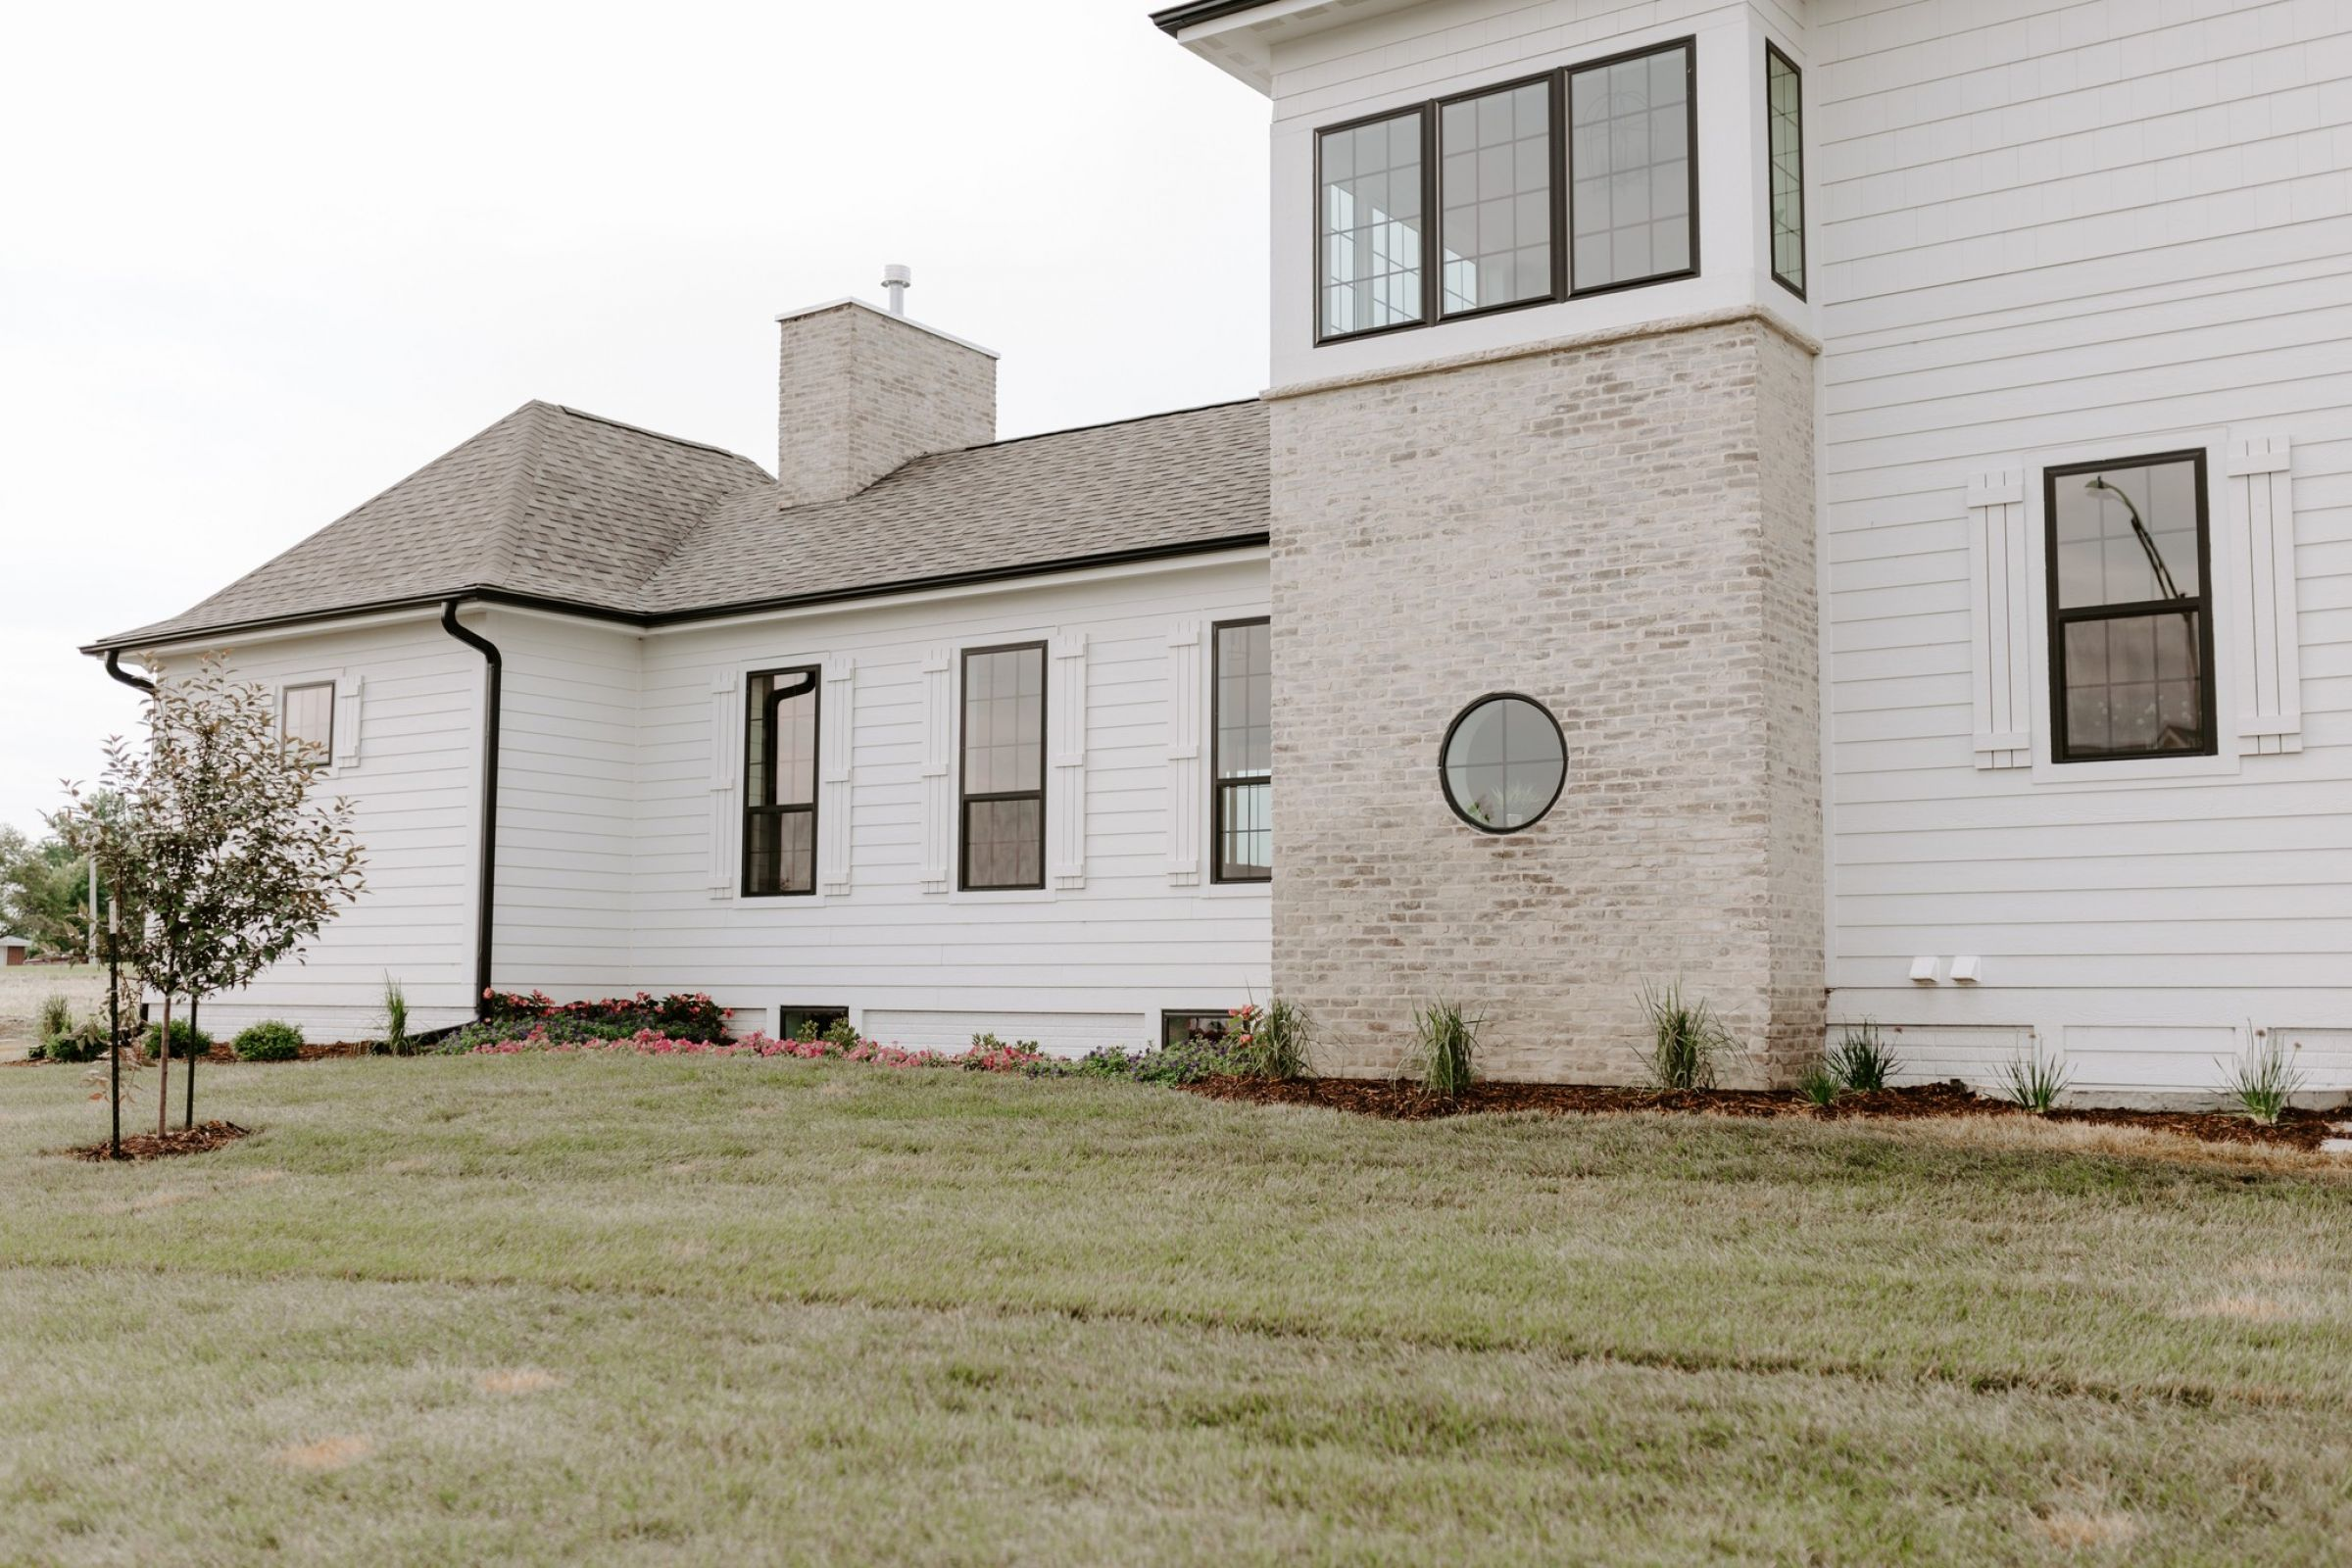 residential-warren-county-iowa-1-acres-listing-number-15524-0-2021-07-12-220159.jpg